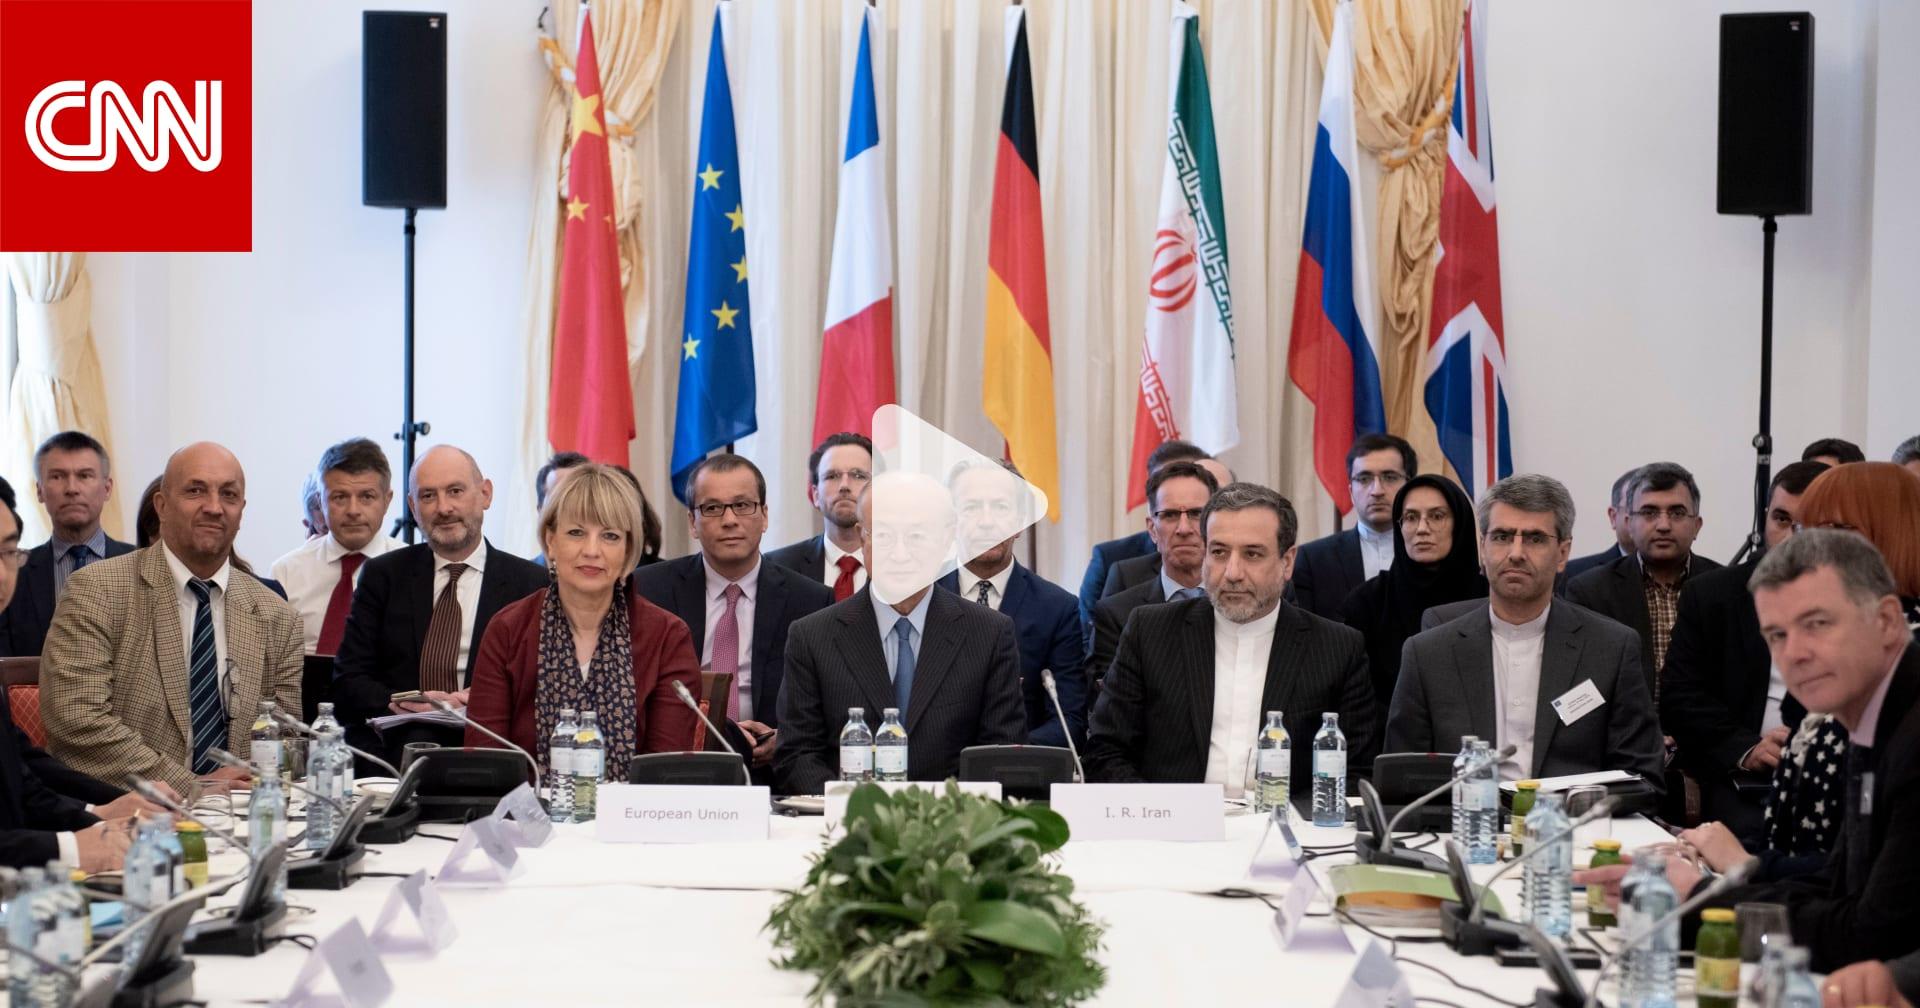 إيران تقول إنها ستستأنف محادثات الاتفاق النووي في نوفمبر